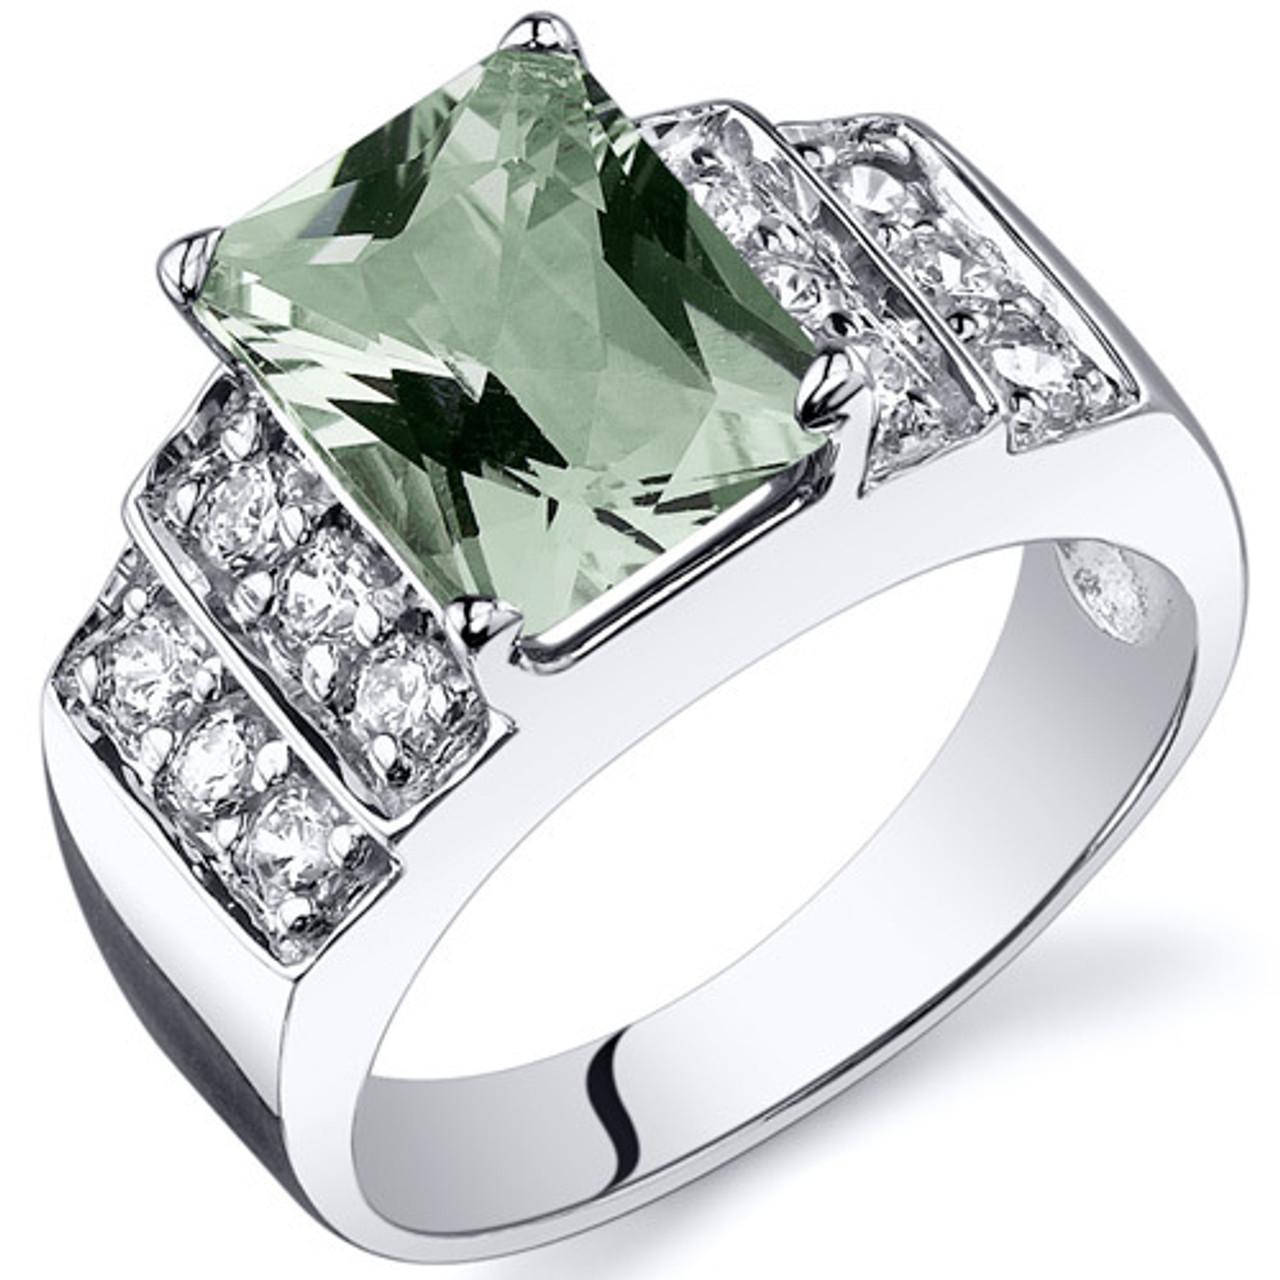 Amethyst Pendant Necklace Sterling Silver Rhodium Nickel Finish 2.75 carats Radiant Cut